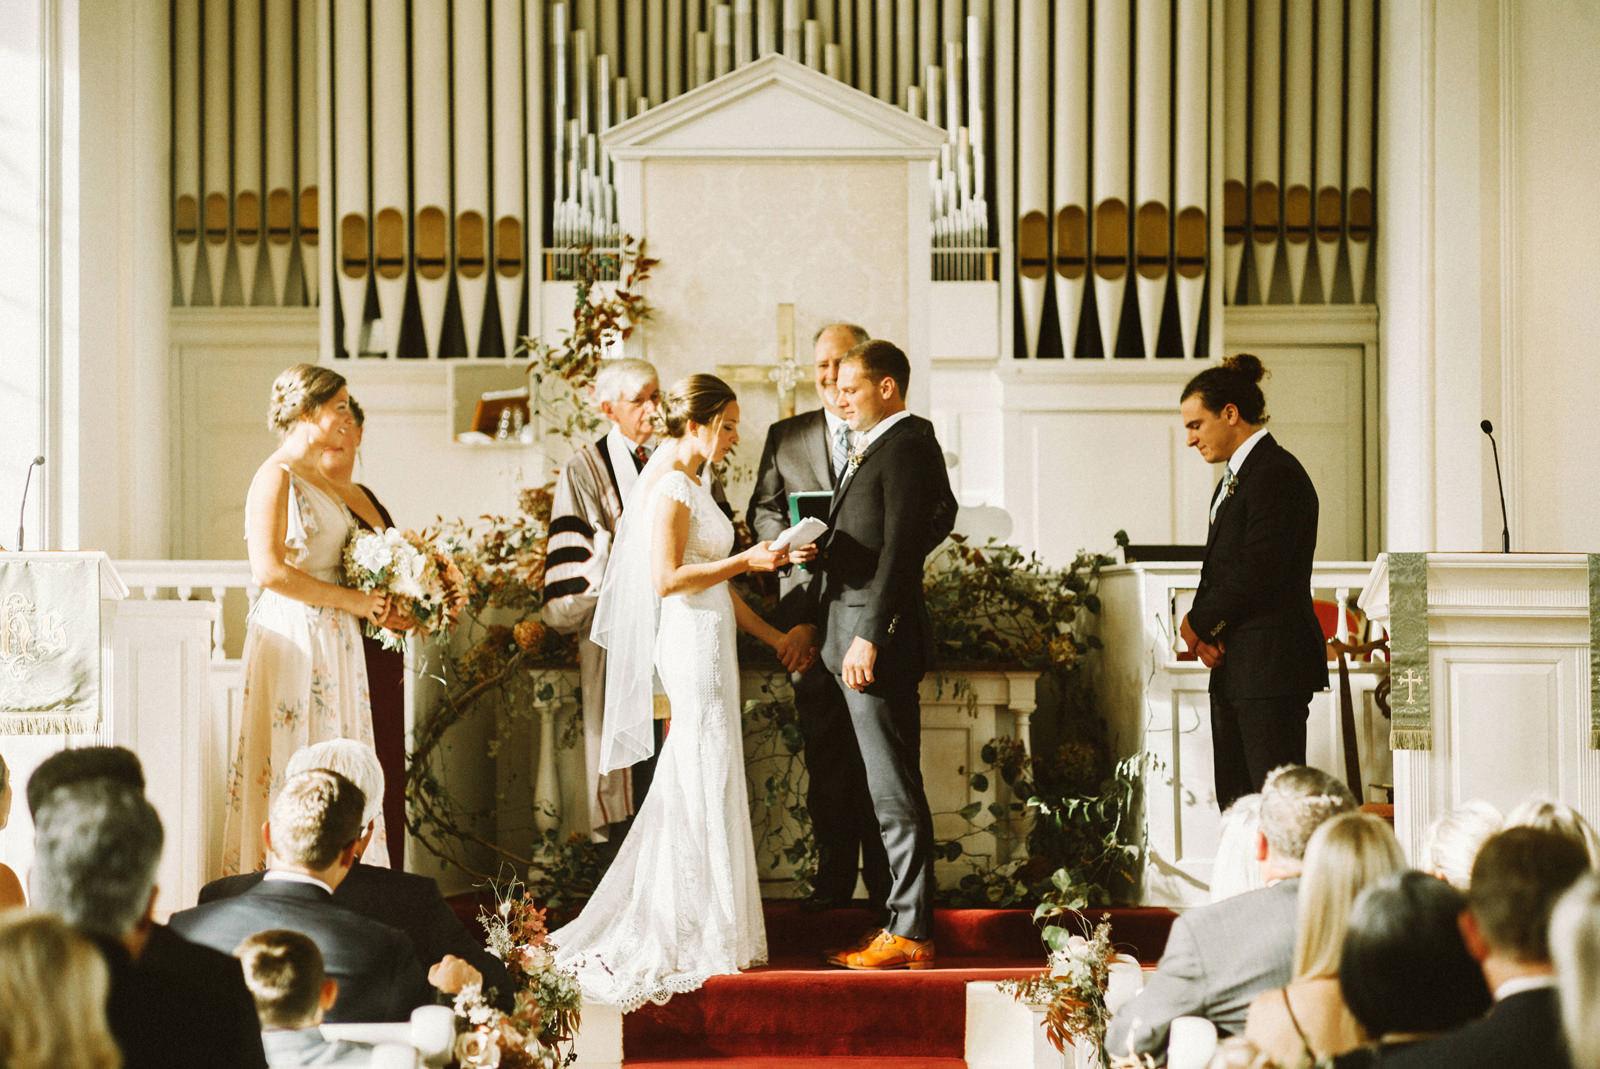 bridgeport-wedding-069 BRIDGEPORT, CONNECTICUT BACKYARD WEDDING